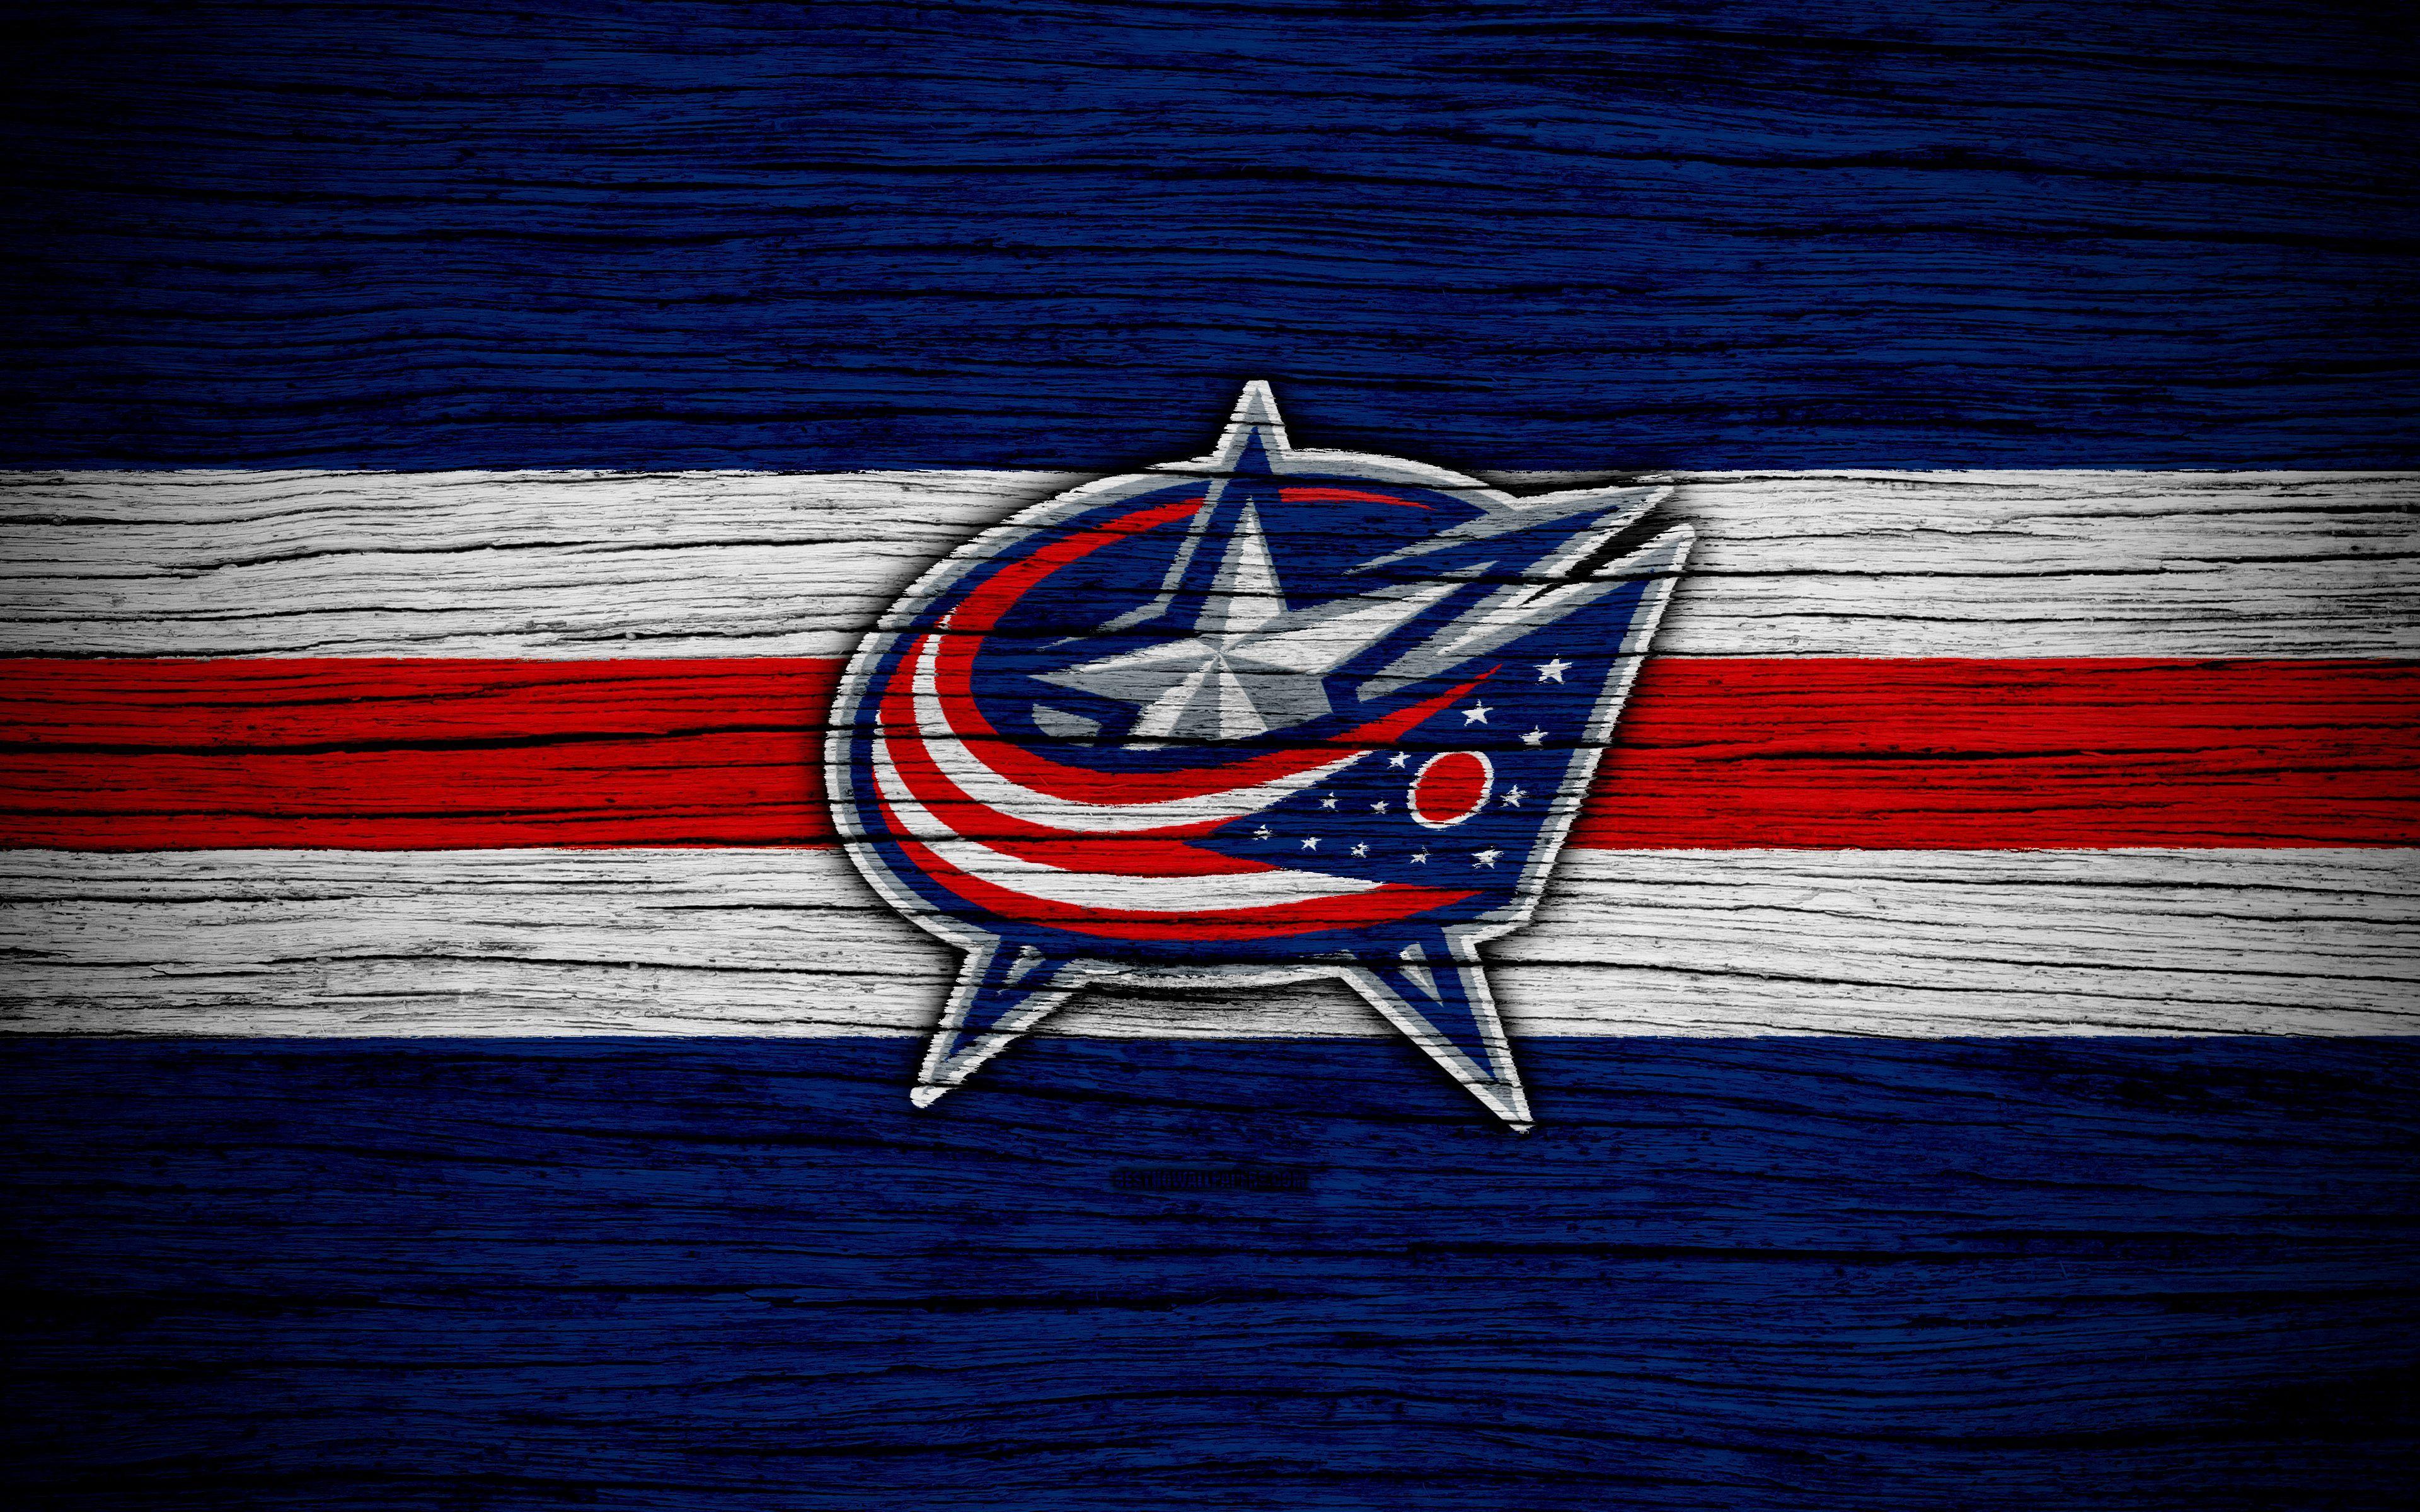 Columbus Blue Jackets Wallpapers - Top Free Columbus Blue ...